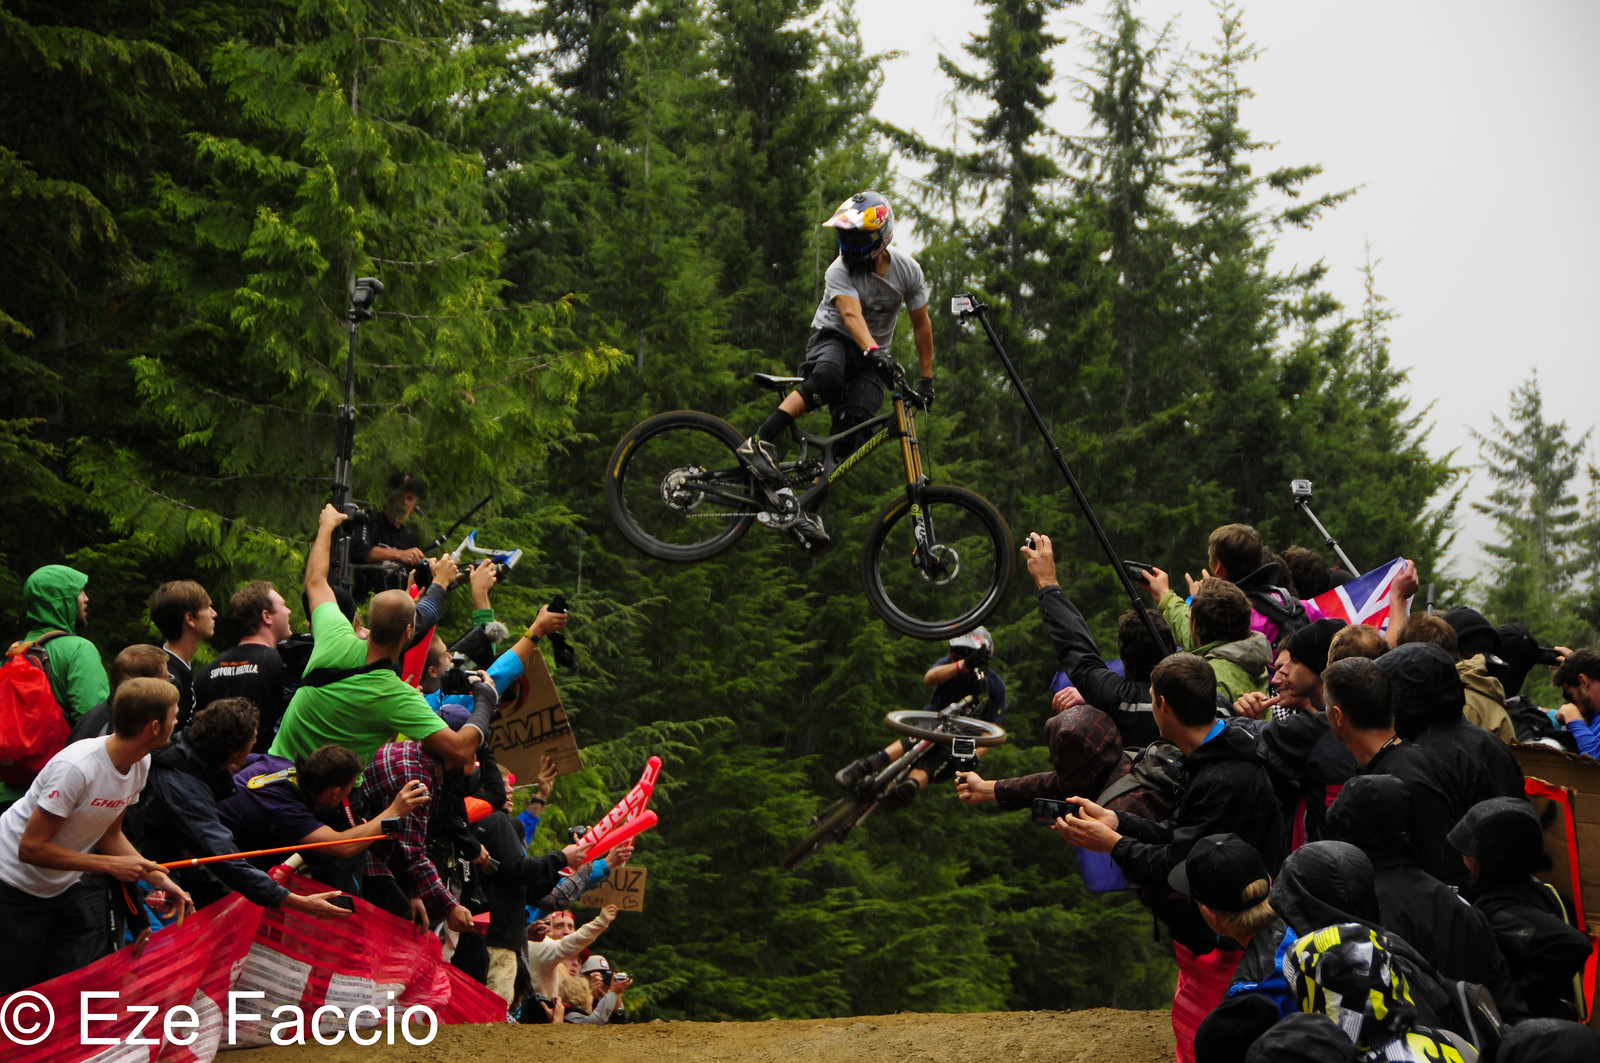 Bernardo Cruz #1 whip of the wolrd - ezefaccio - Mountain Biking Pictures - Vital MTB